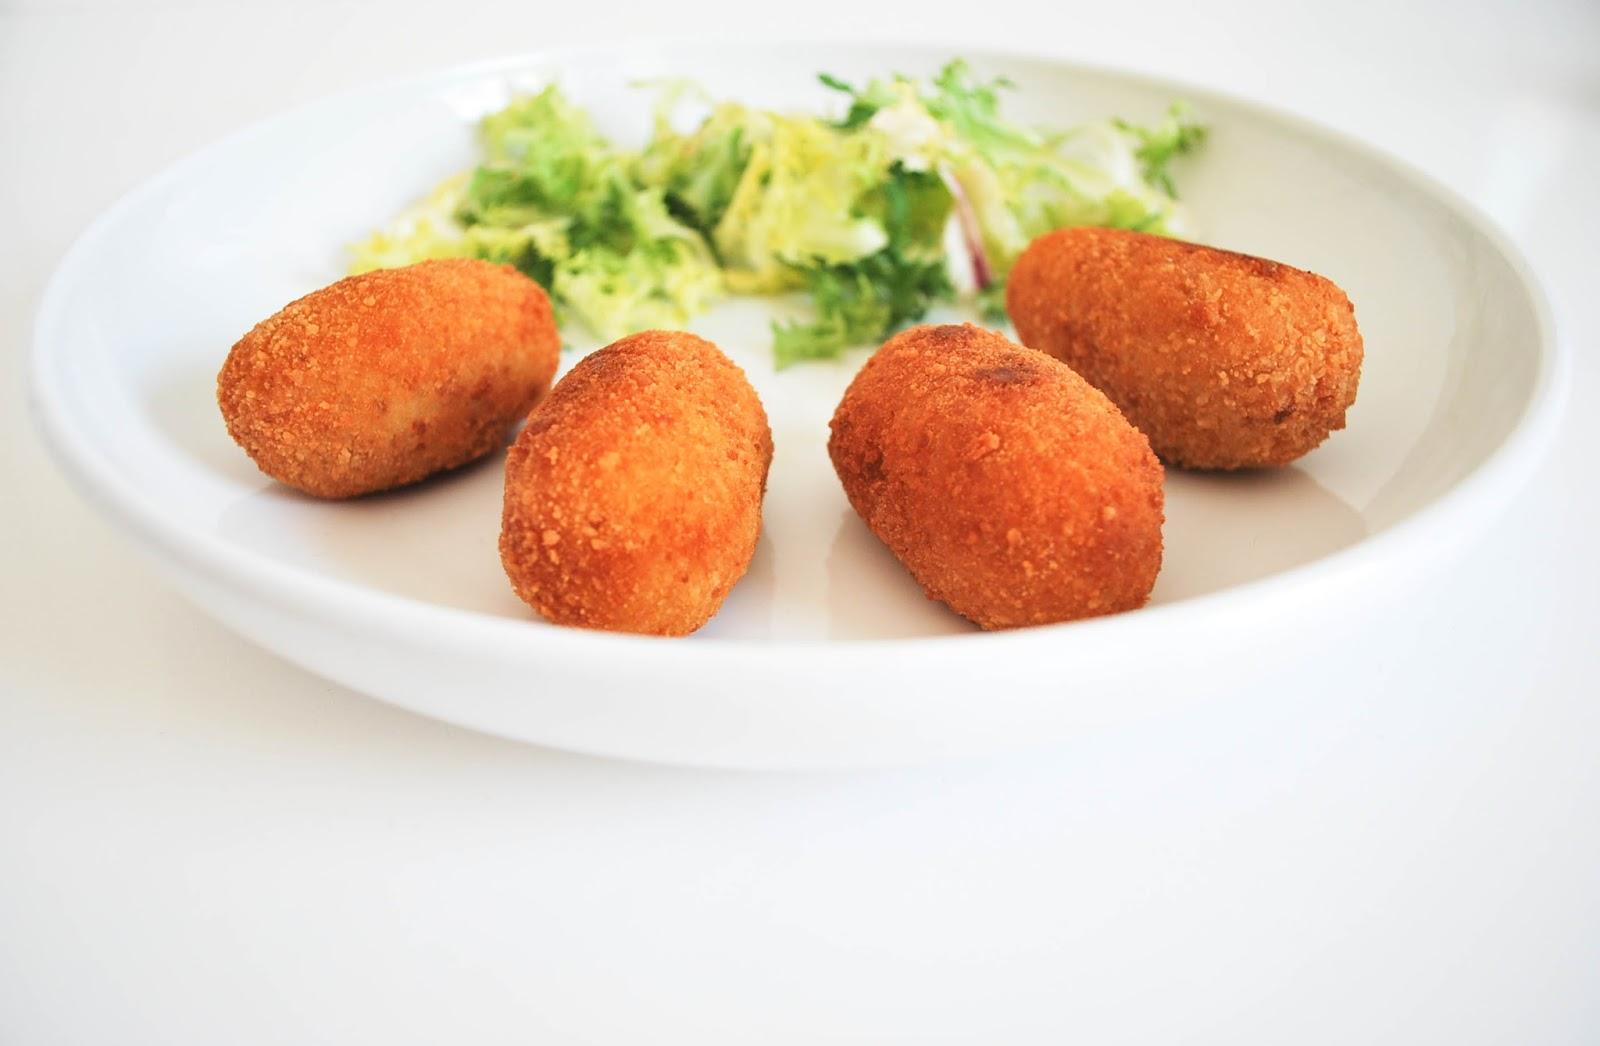 http://www.hommum.com/2014/06/creative-food-band-croquetas-caseras-sin-gluten.html #recetassingluten